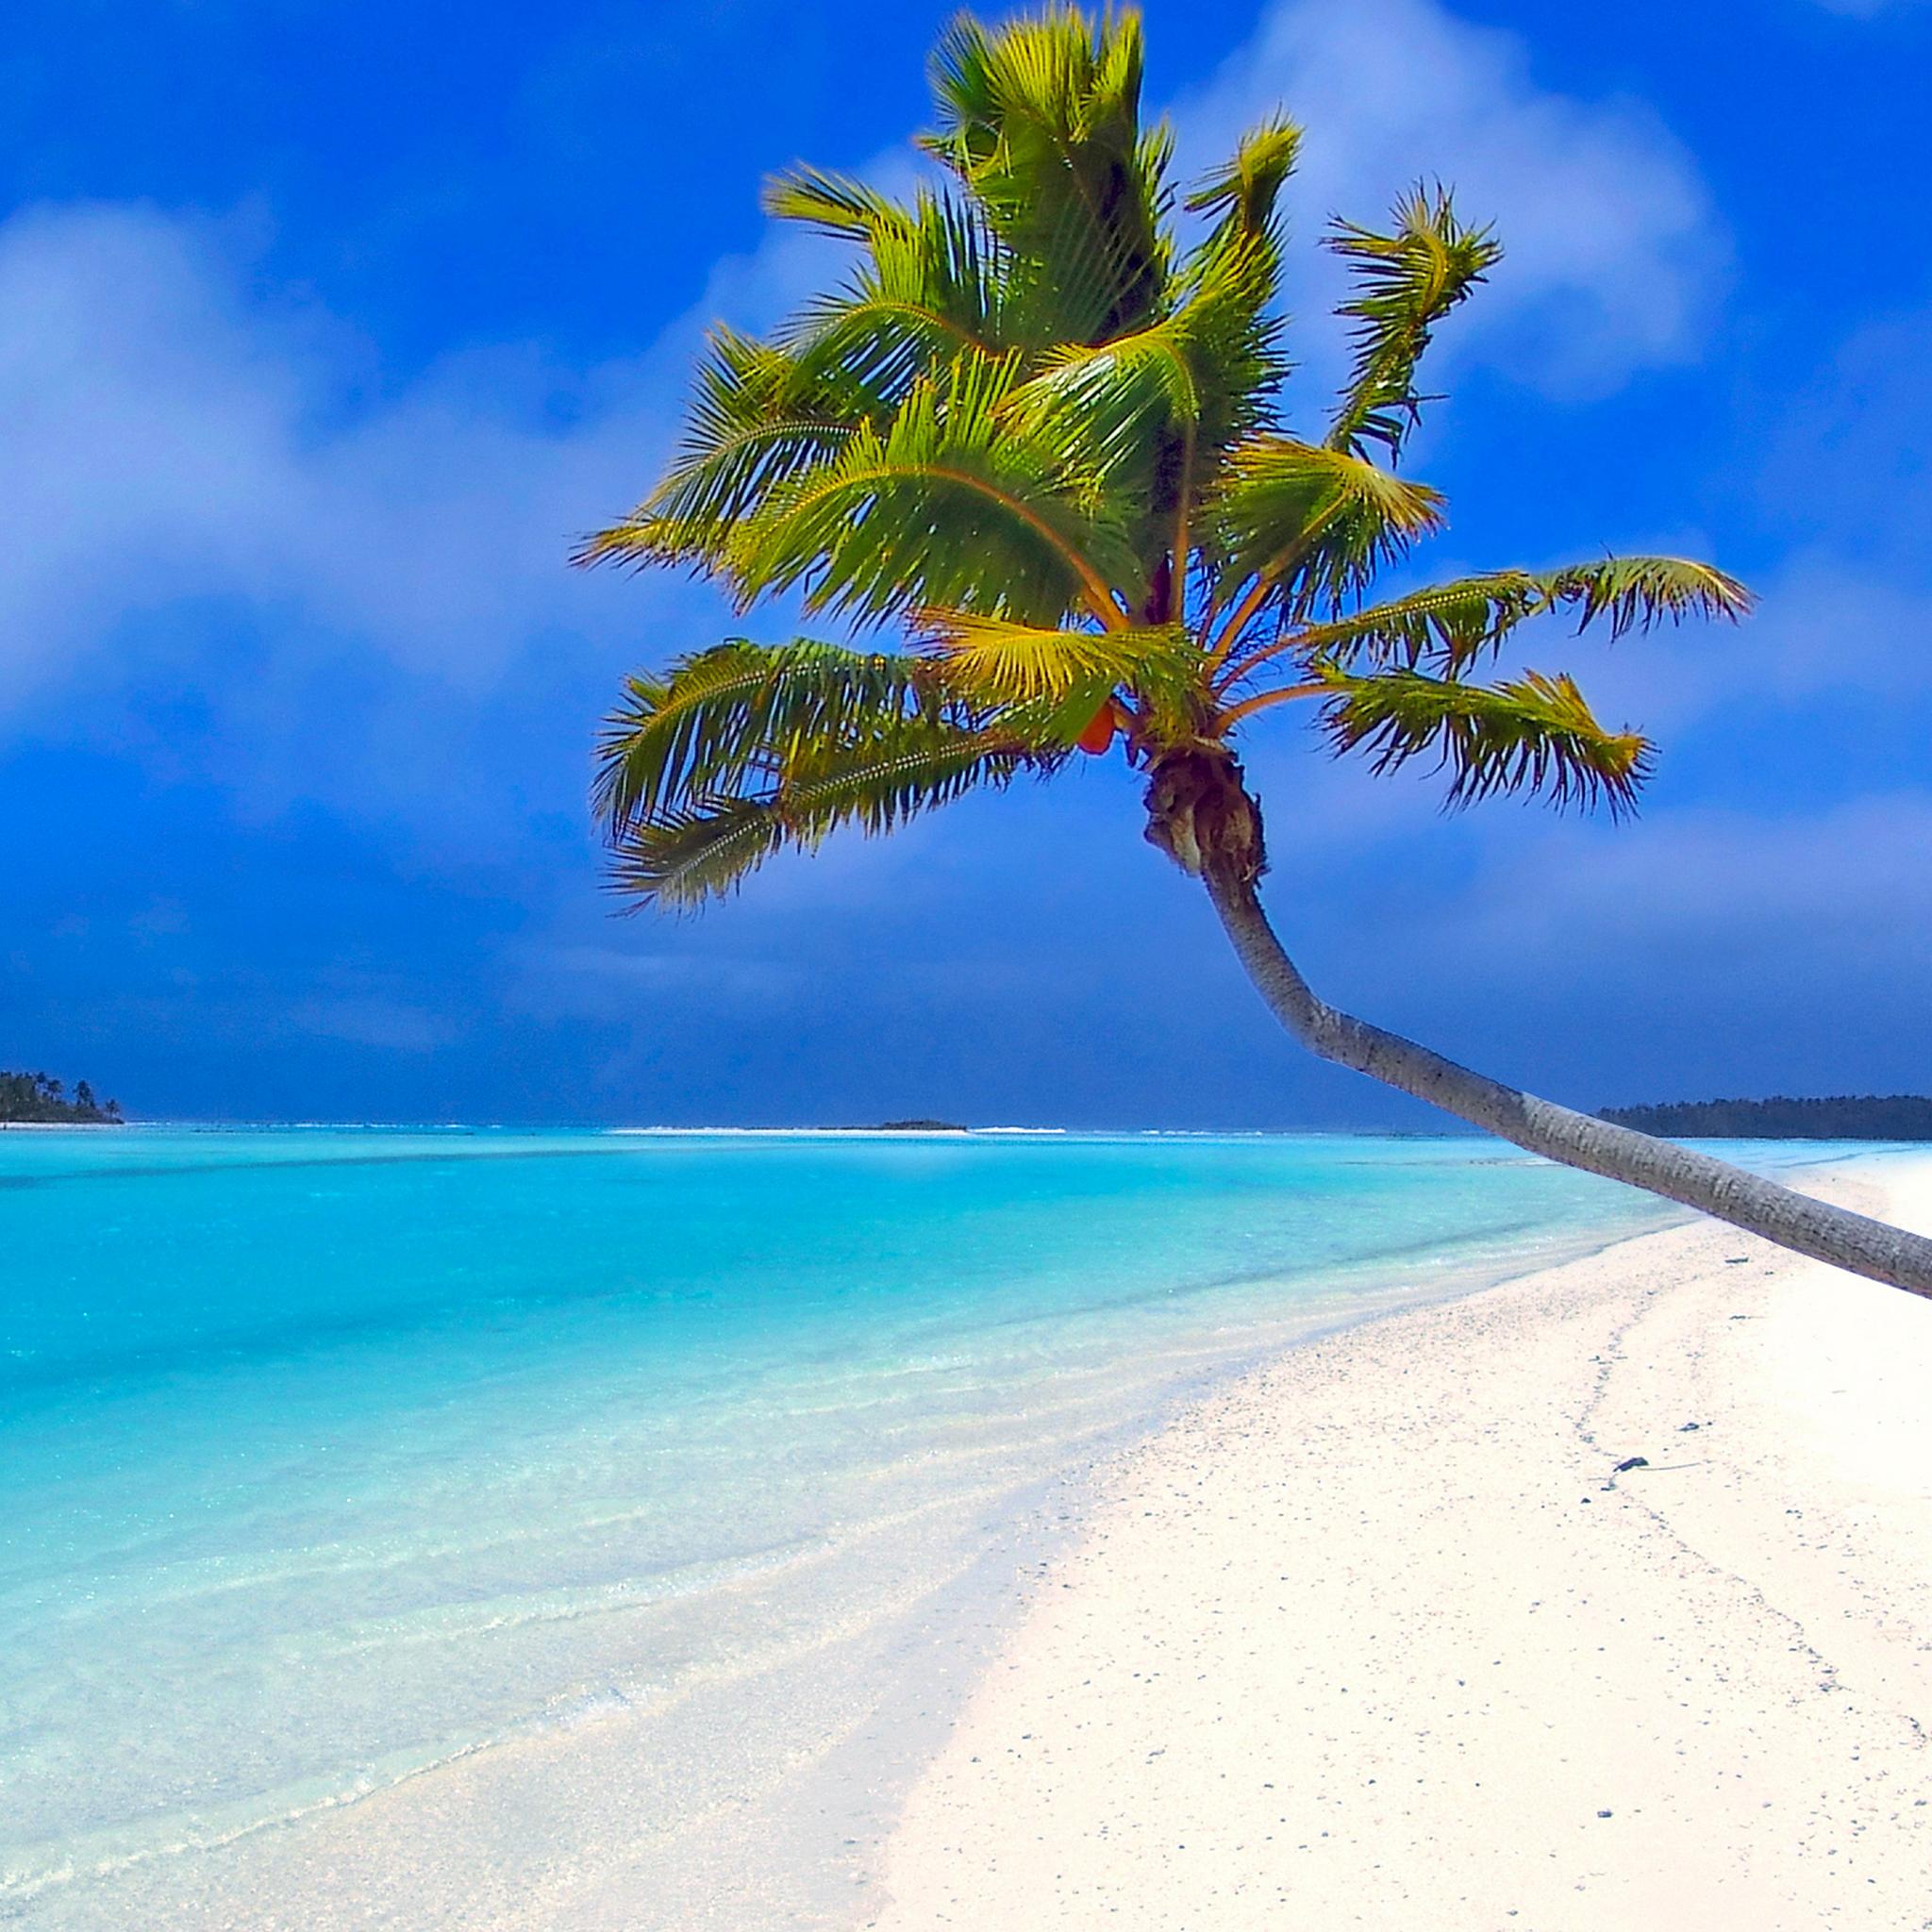 A Palm Tree On Beach Ipad Retina Wallpaper For Iphone X 8